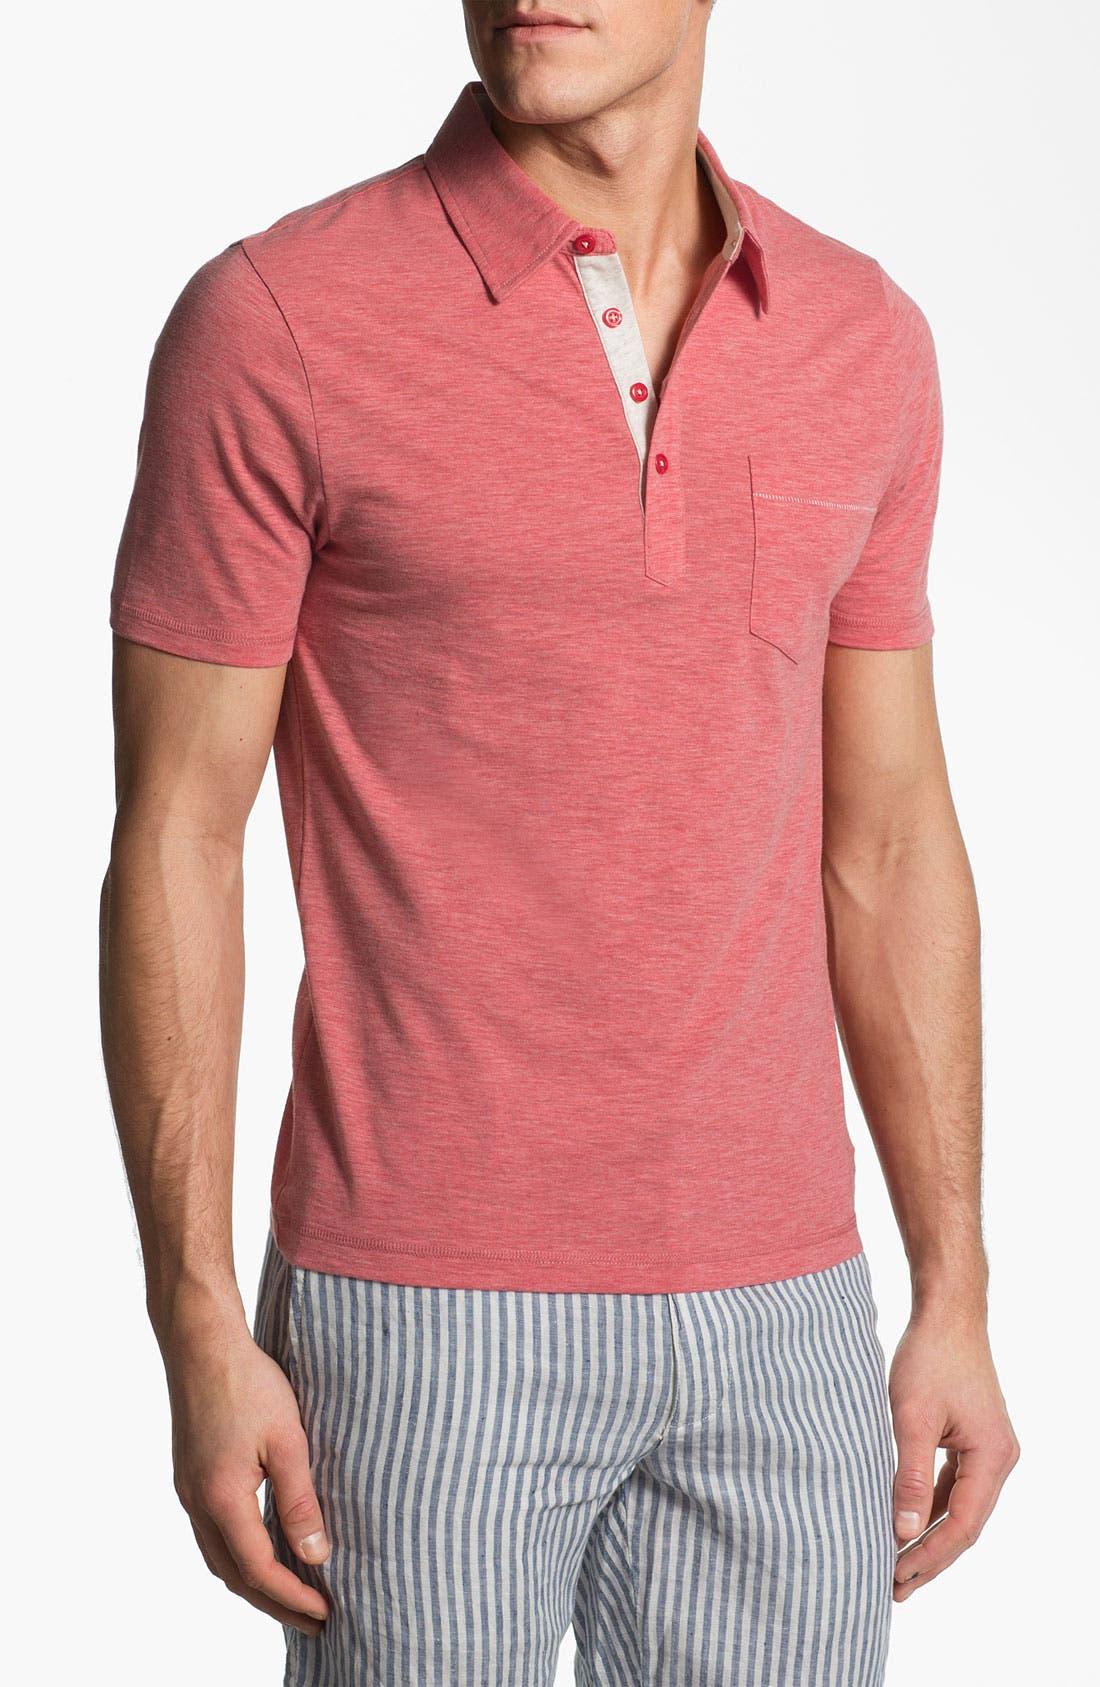 Main Image - Original Penguin 'Bing' Slub Jersey Polo Shirt